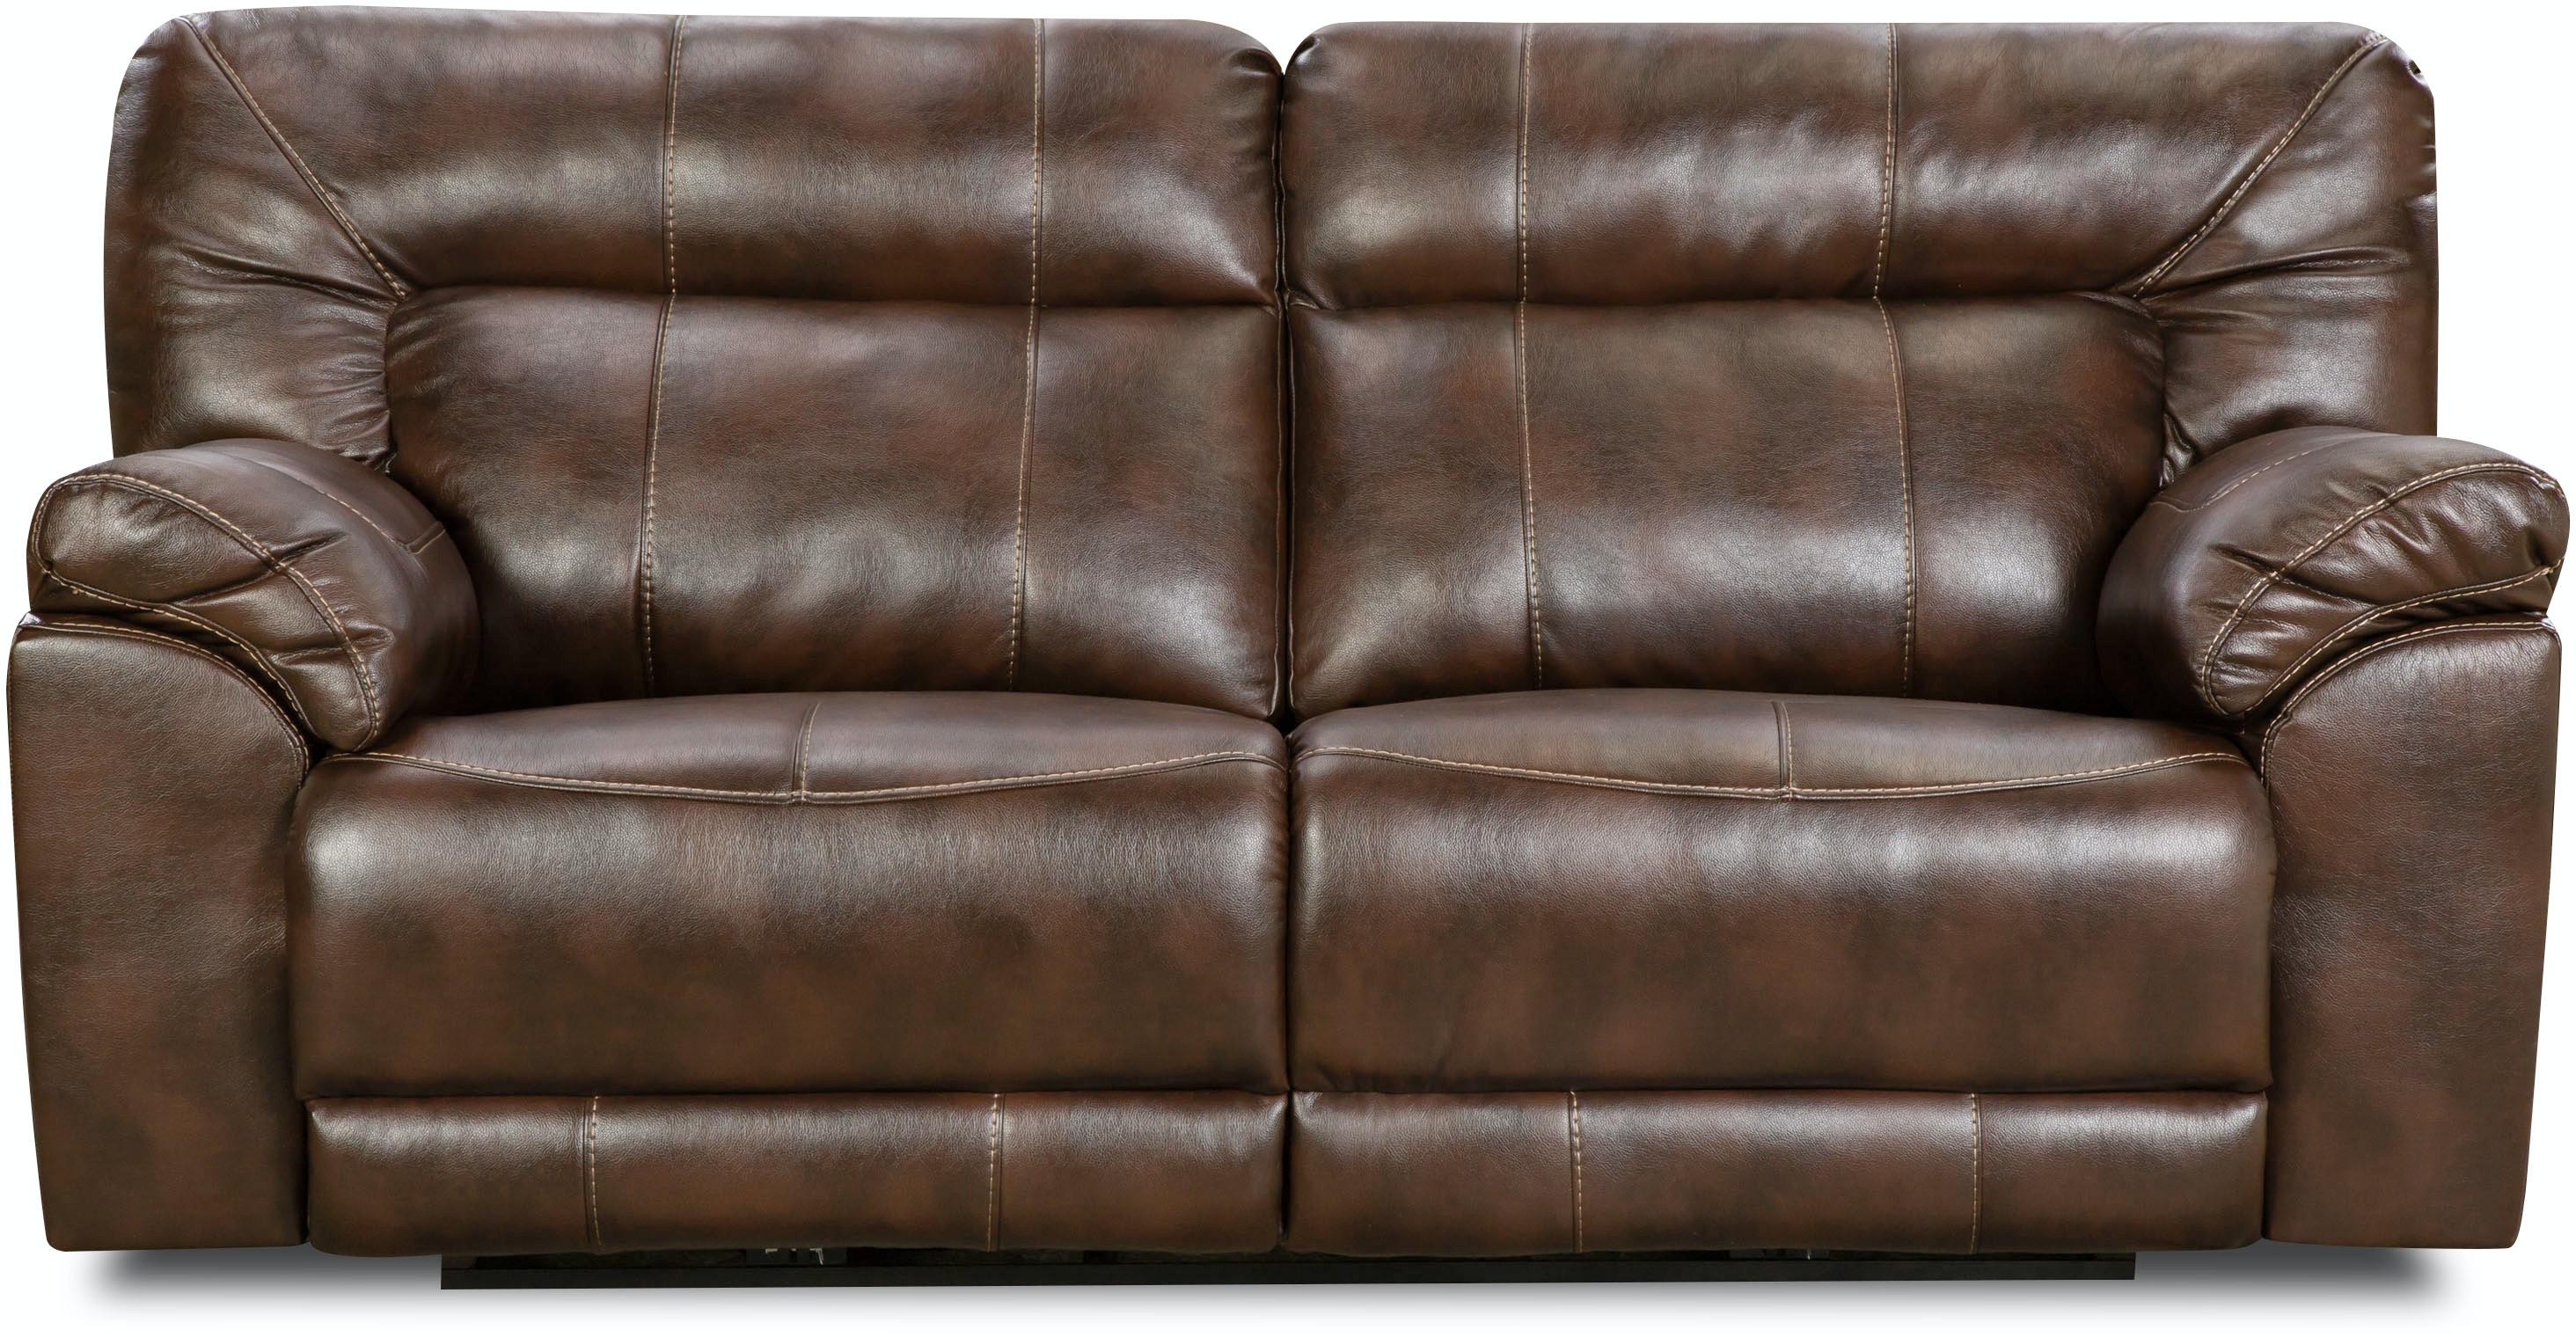 Simmons Upholstery Living Room Abilene Tobacco Reclining Sofa